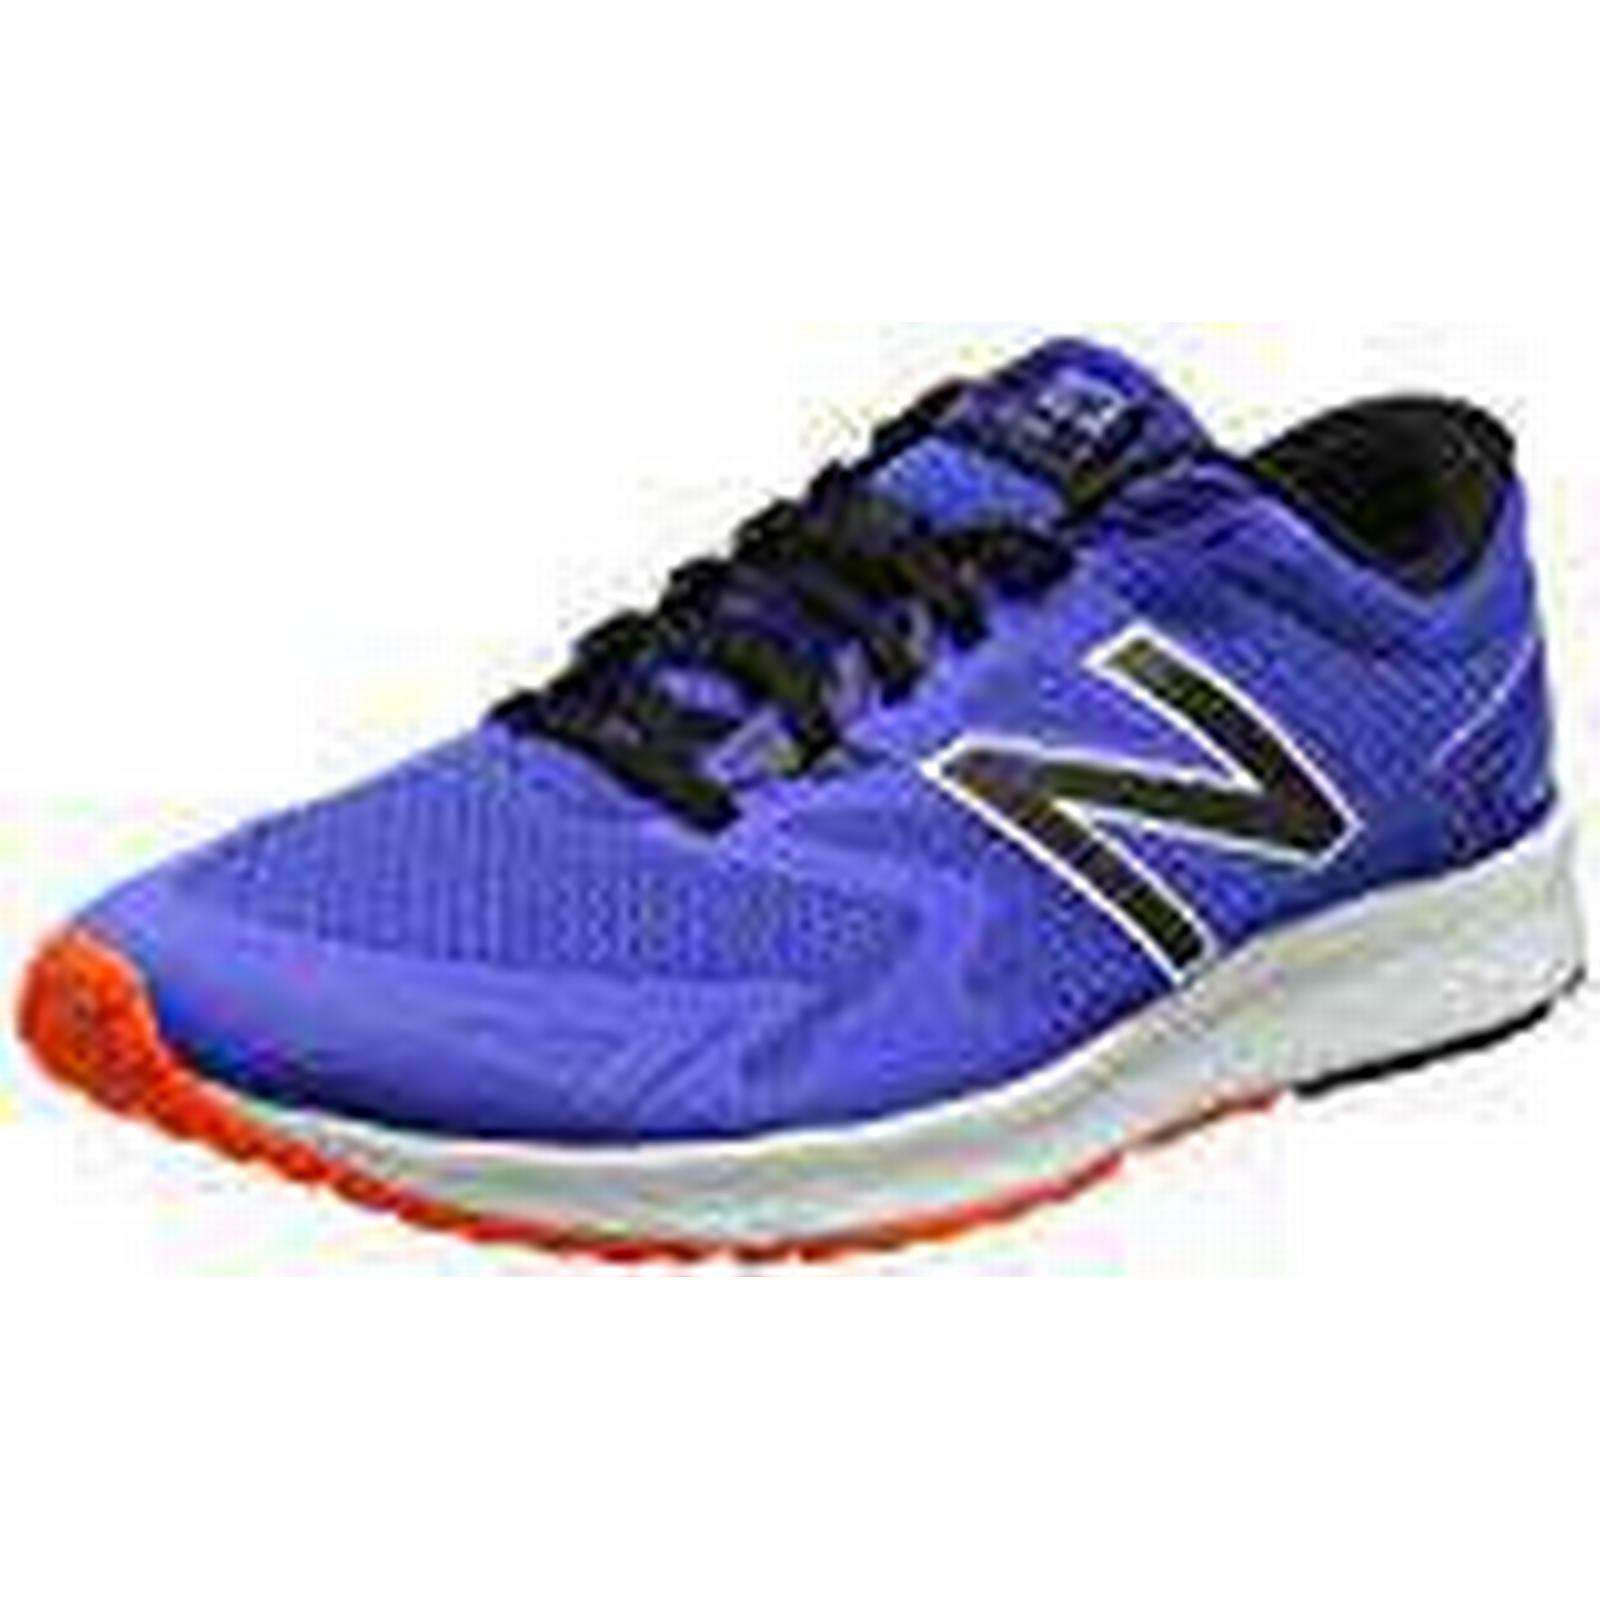 New Balance Men's Flash 8 v2 Running Shoes, (Blue/Black), 8 Flash UK 42 EU 284a6c